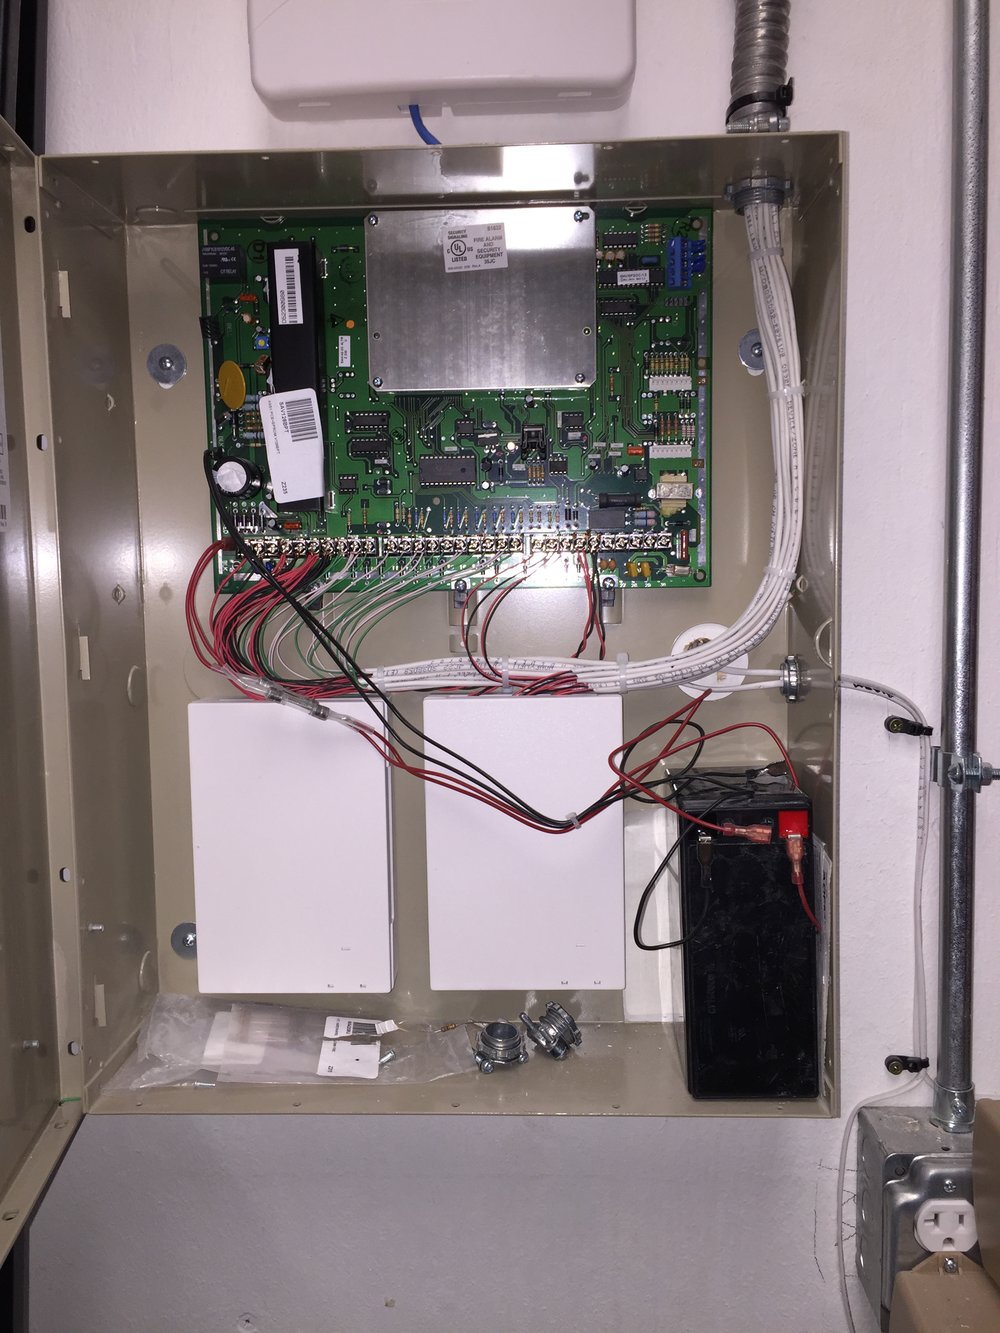 Wired Burglary Alarm system